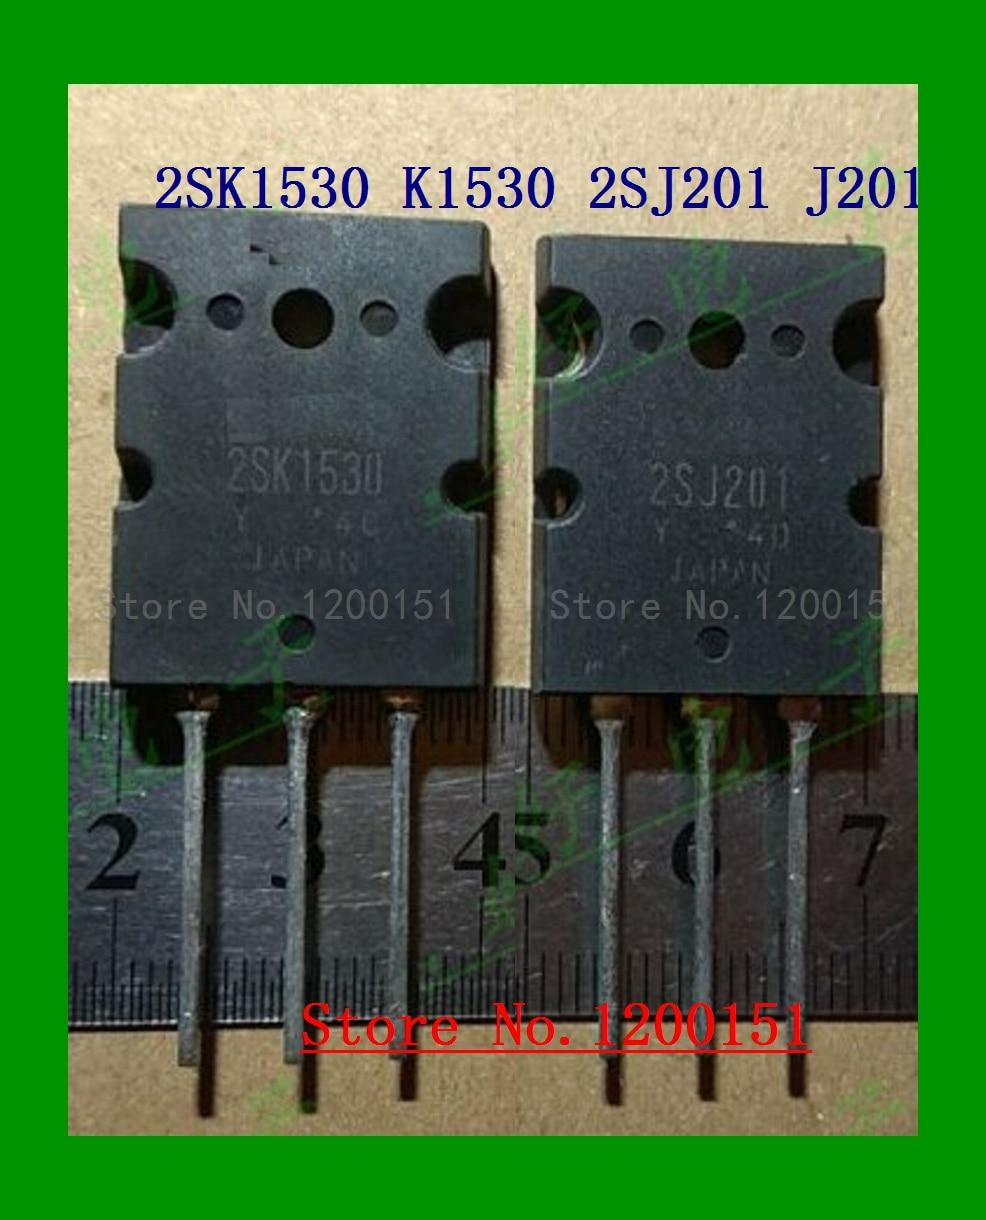 (2SK1530 K1530 2SJ201 J201)(NEP250 NEN250)(2SK389 2SJ109)(2SD588 2SB618) Matching tube(2SK1530 K1530 2SJ201 J201)(NEP250 NEN250)(2SK389 2SJ109)(2SD588 2SB618) Matching tube